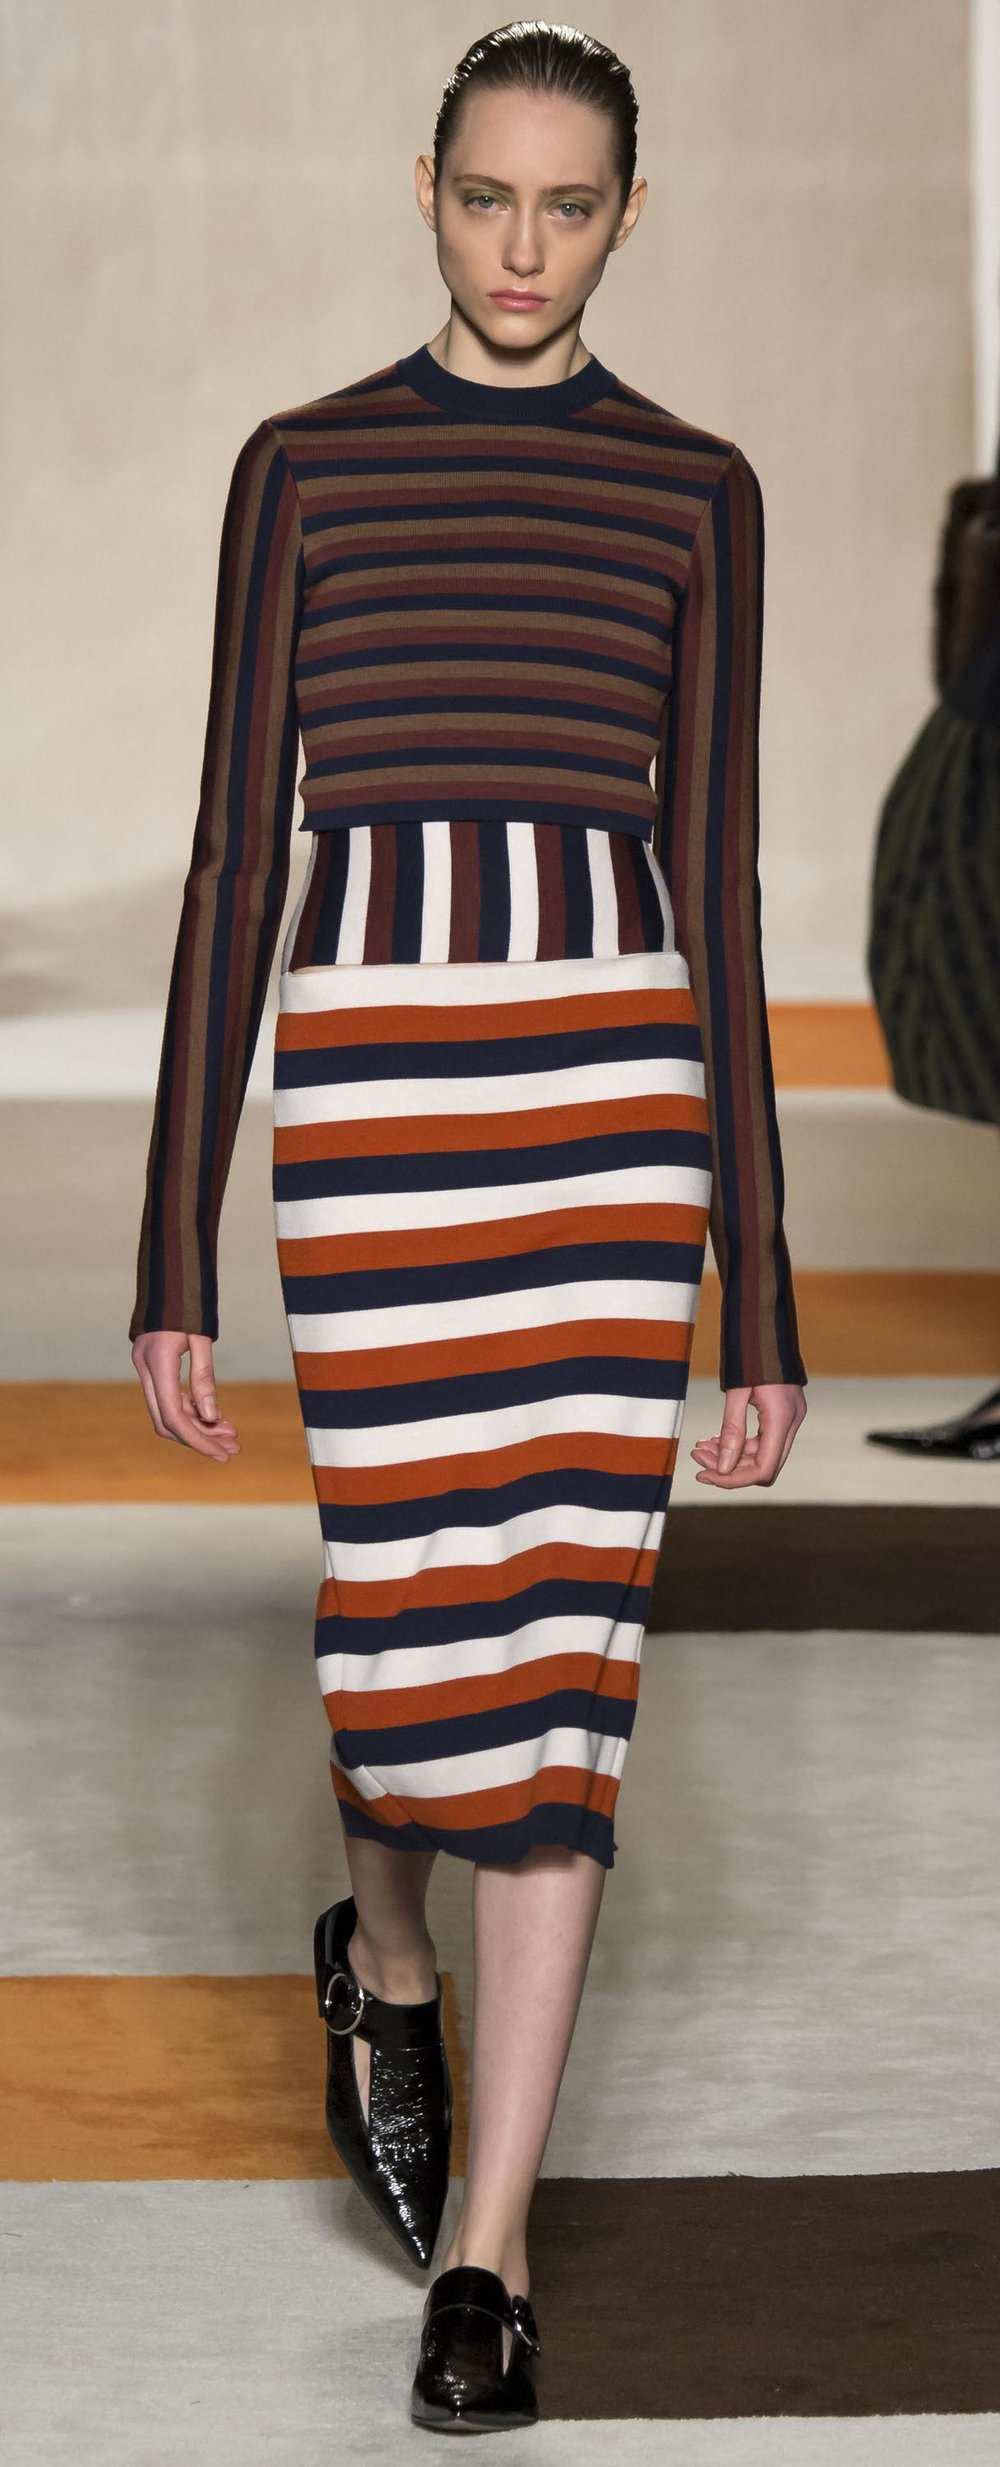 detail-dramatic-style-type-runway-mix-stripes-print-pencil-brogues.jpg